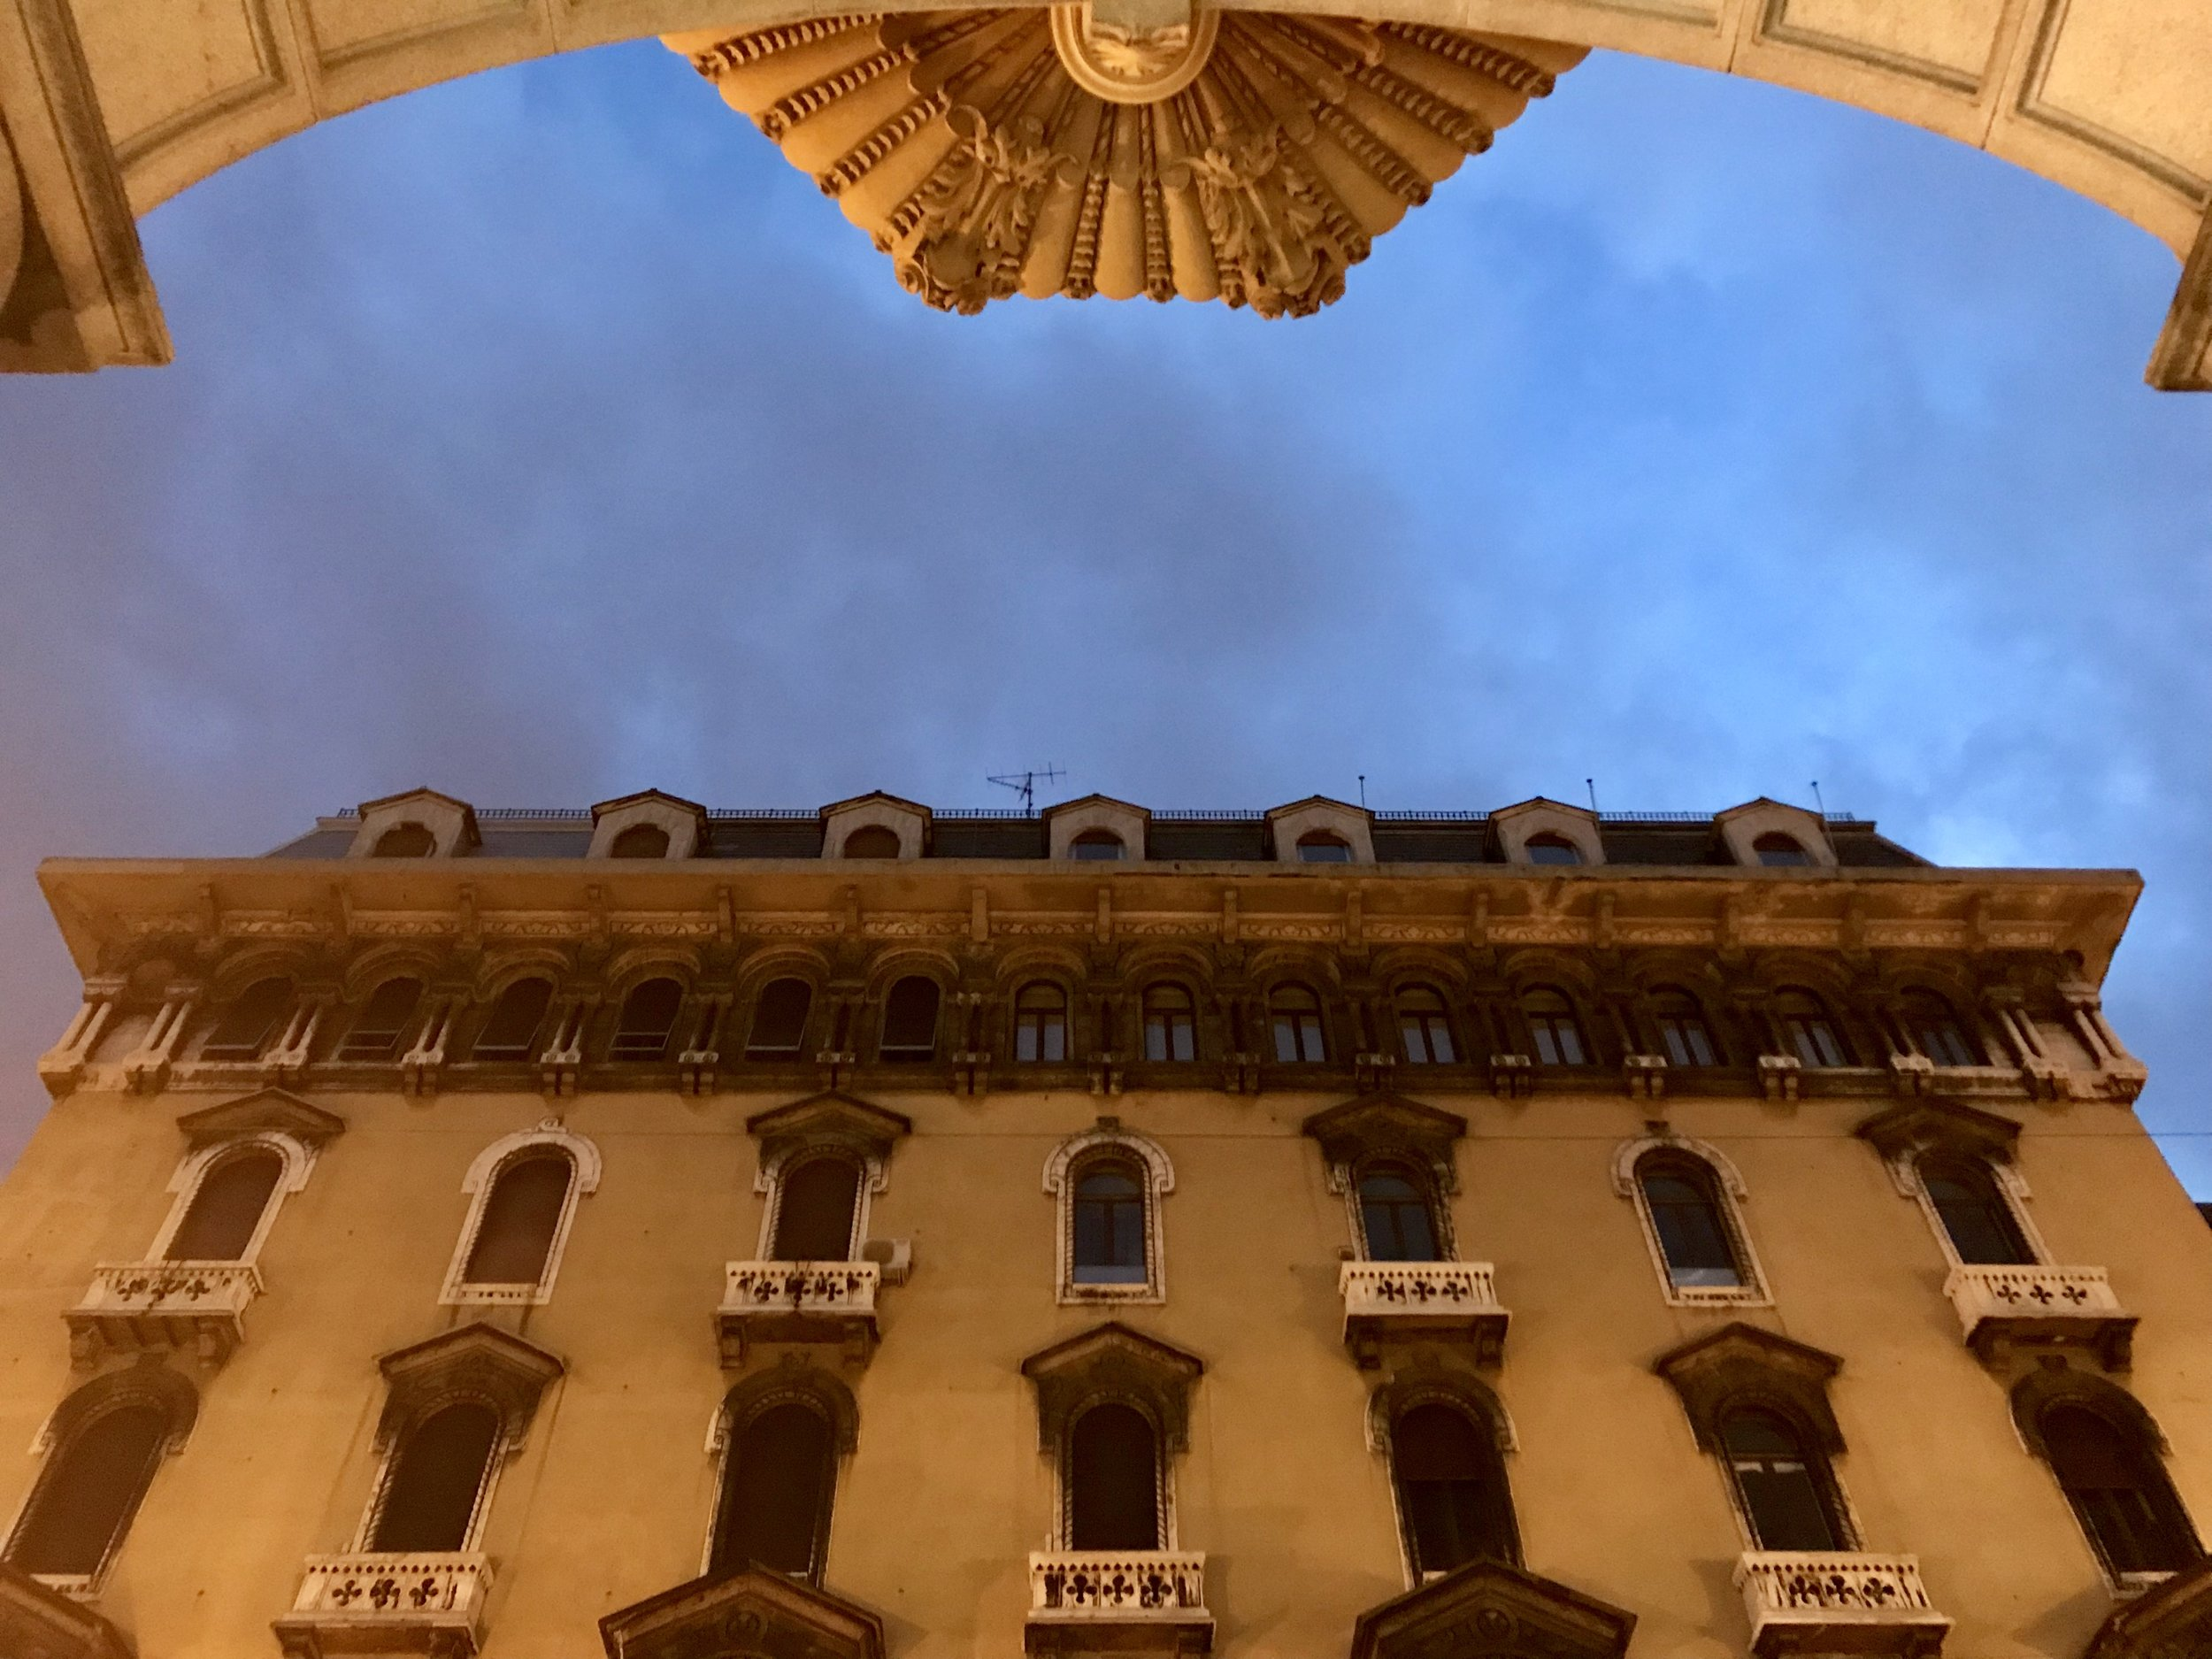 genoa palaces evening.jpeg